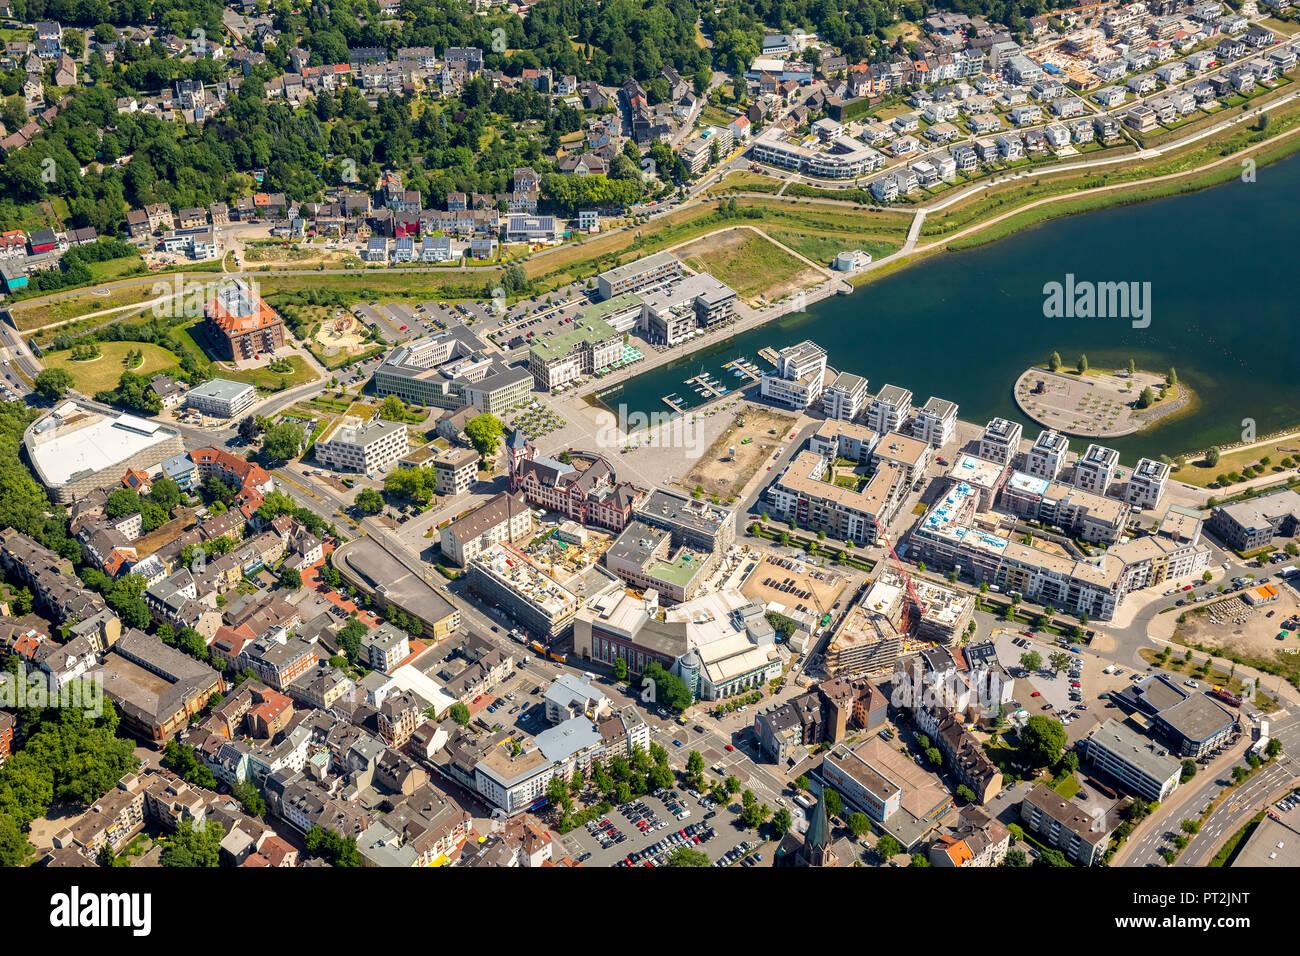 Dortmund, Ruhr area, North Rhine-Westphalia, Germany - Stock Image